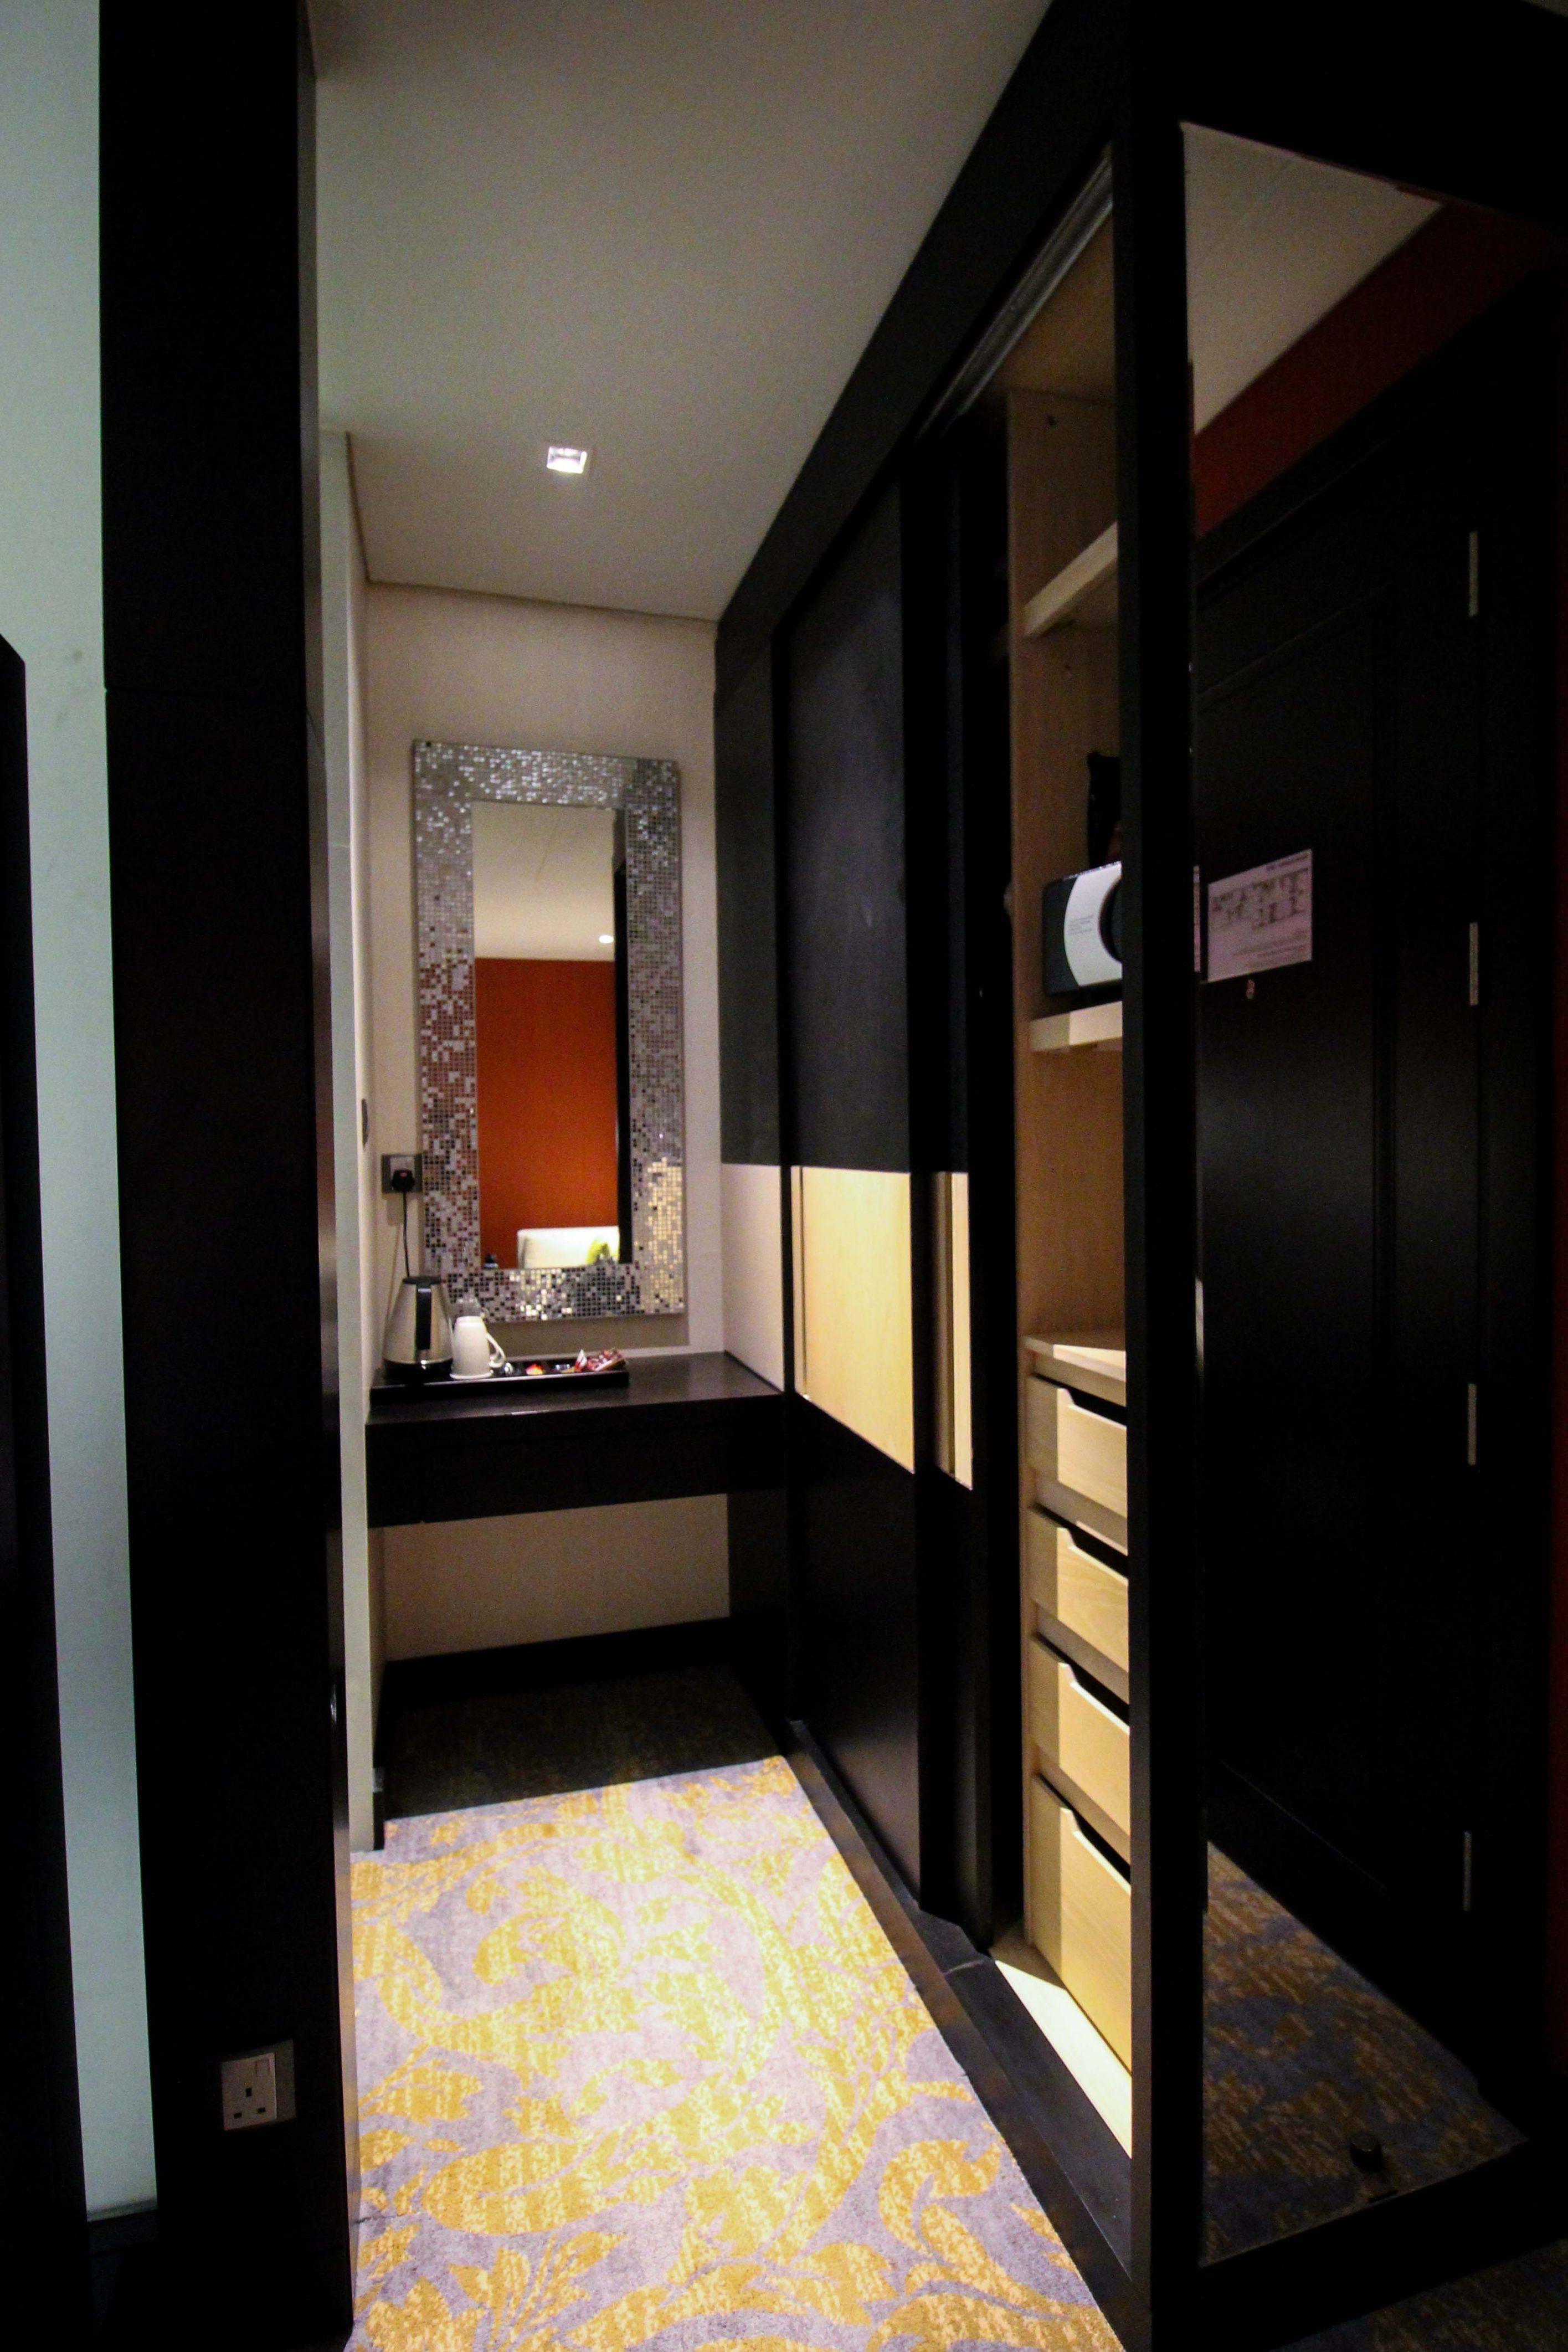 Mövenpick Colombo Hotel Reiseblog Reisebericht Superior Zimmer King-Size Bett Meerblick Rundreise Sri Lanka Ankleideraum